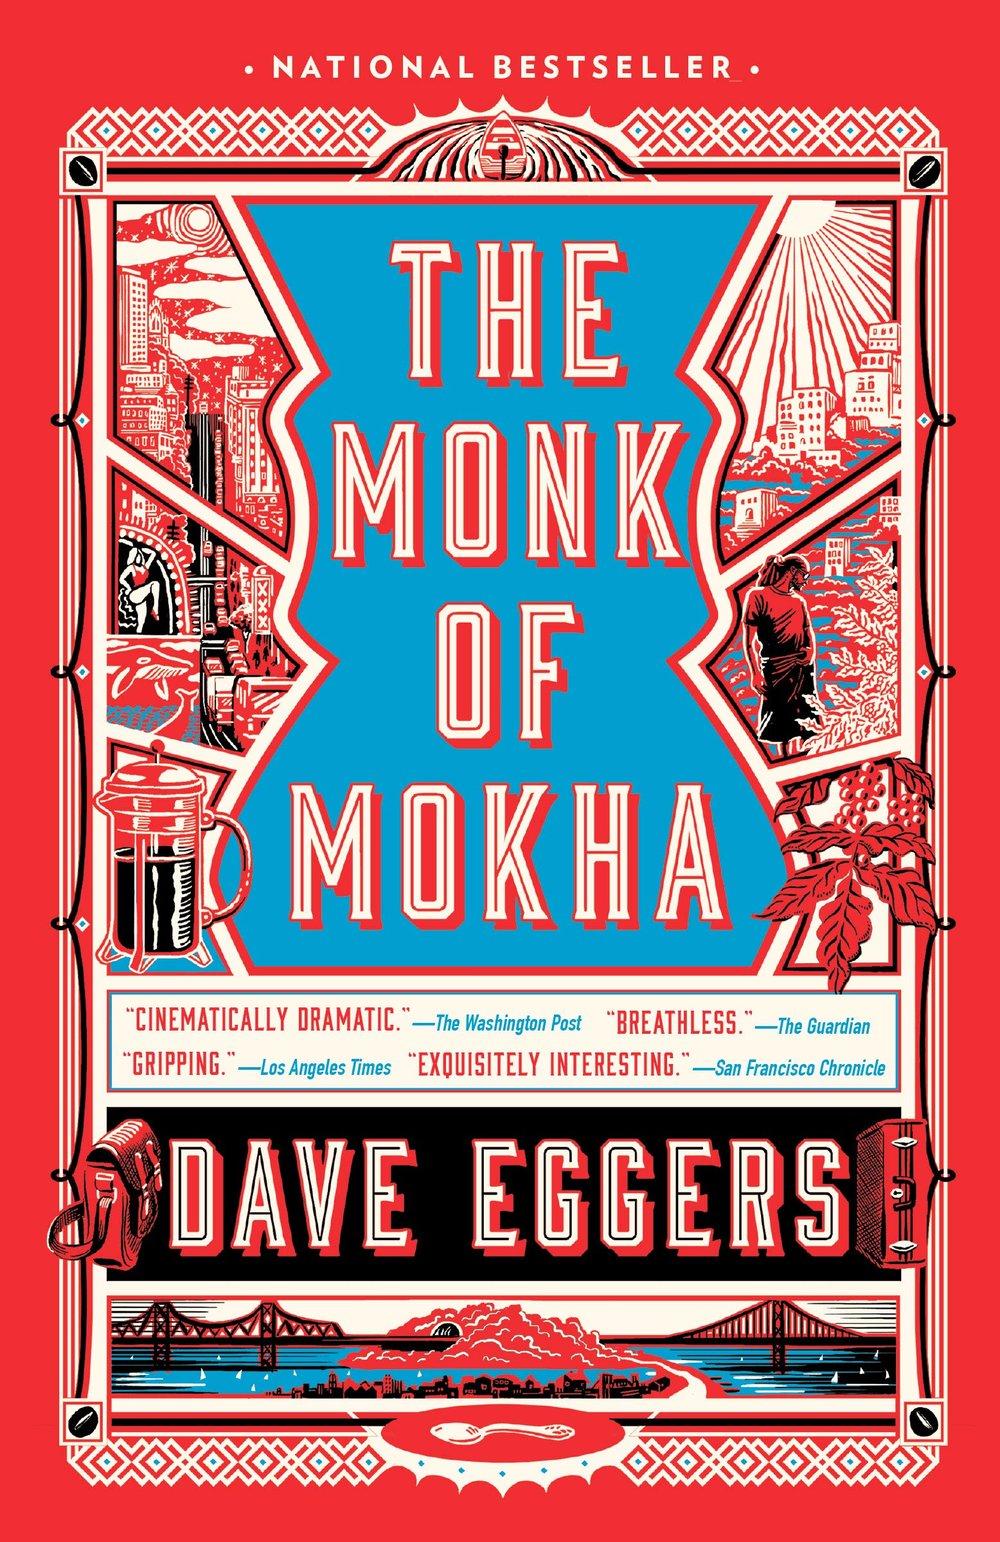 the monk of mocha.jpg